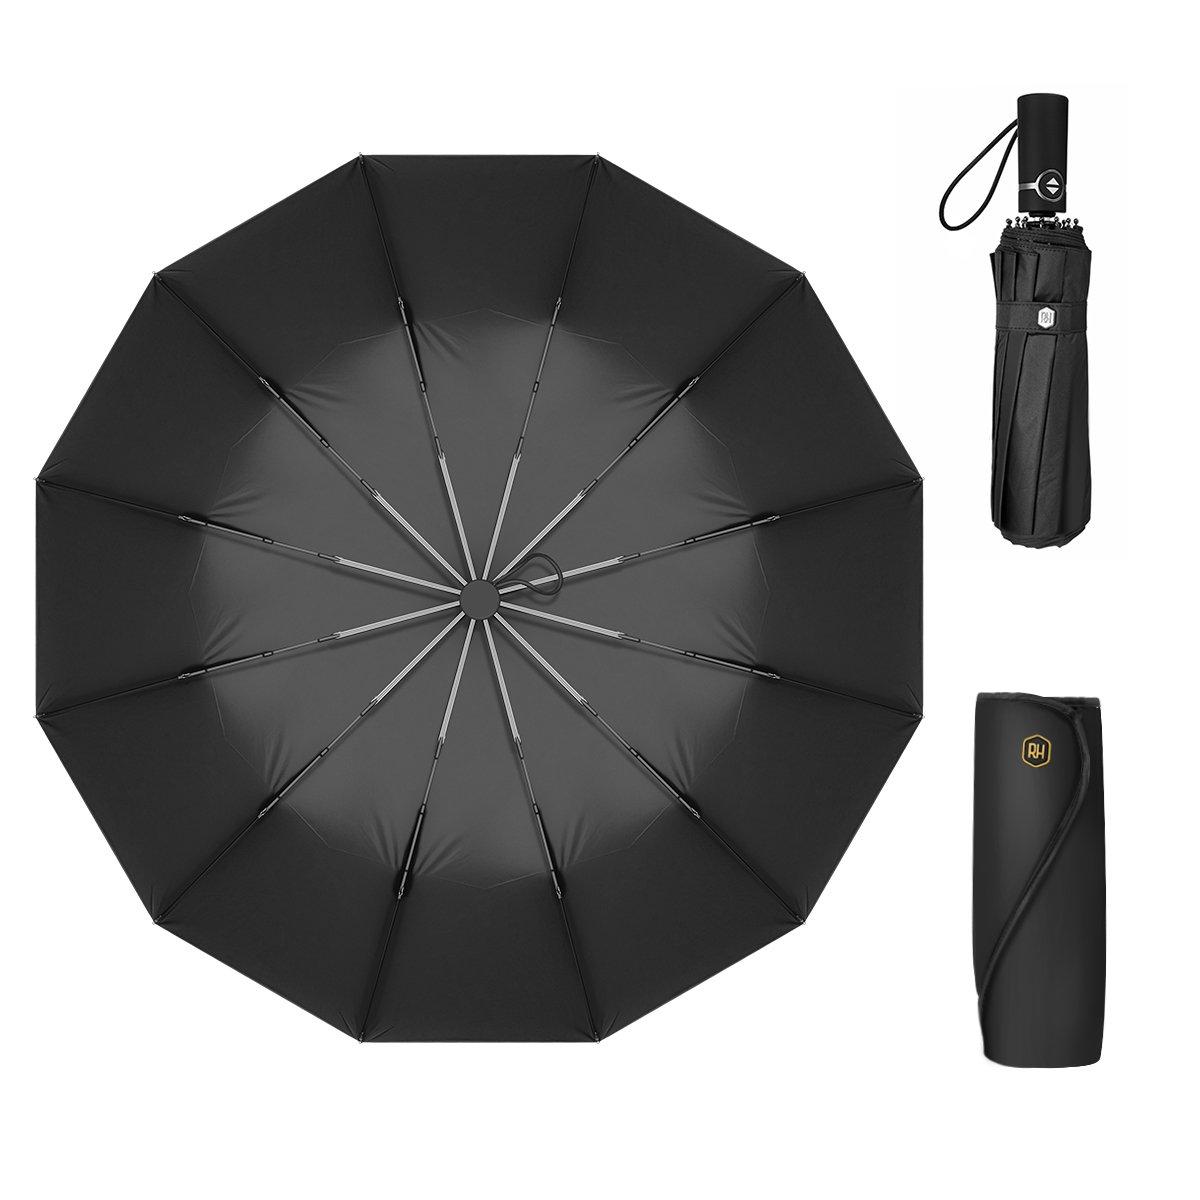 12 Ribs Travel Umbrella Windproof-Compact Umbrella with Auto Open/Close- Simplified Design Umbrella for Men&Women Ruxy Humy (Black)